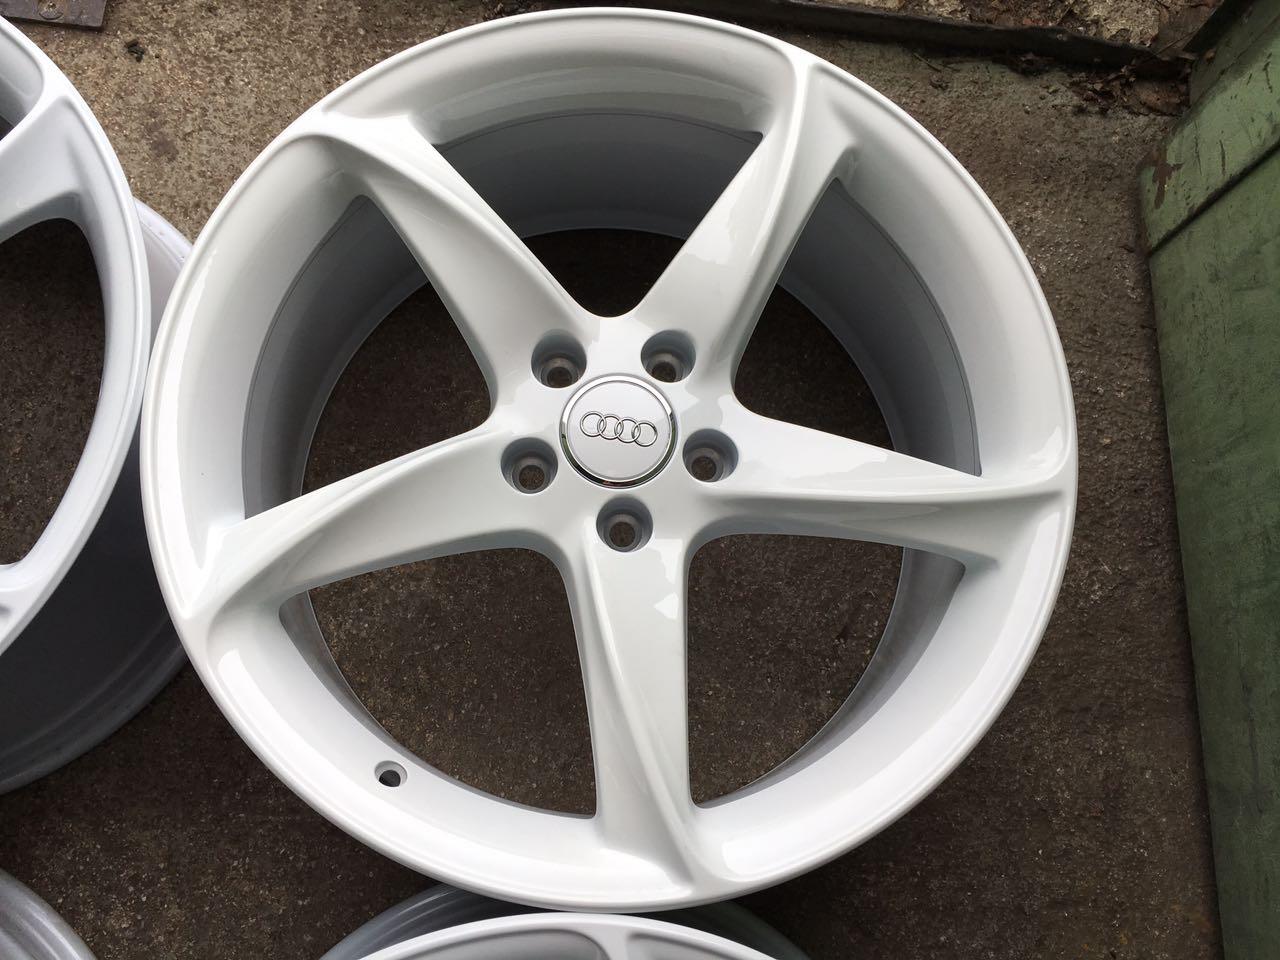 Unieke Witte Originele 19 Inch Audi A3tt Velgen Evt Banden